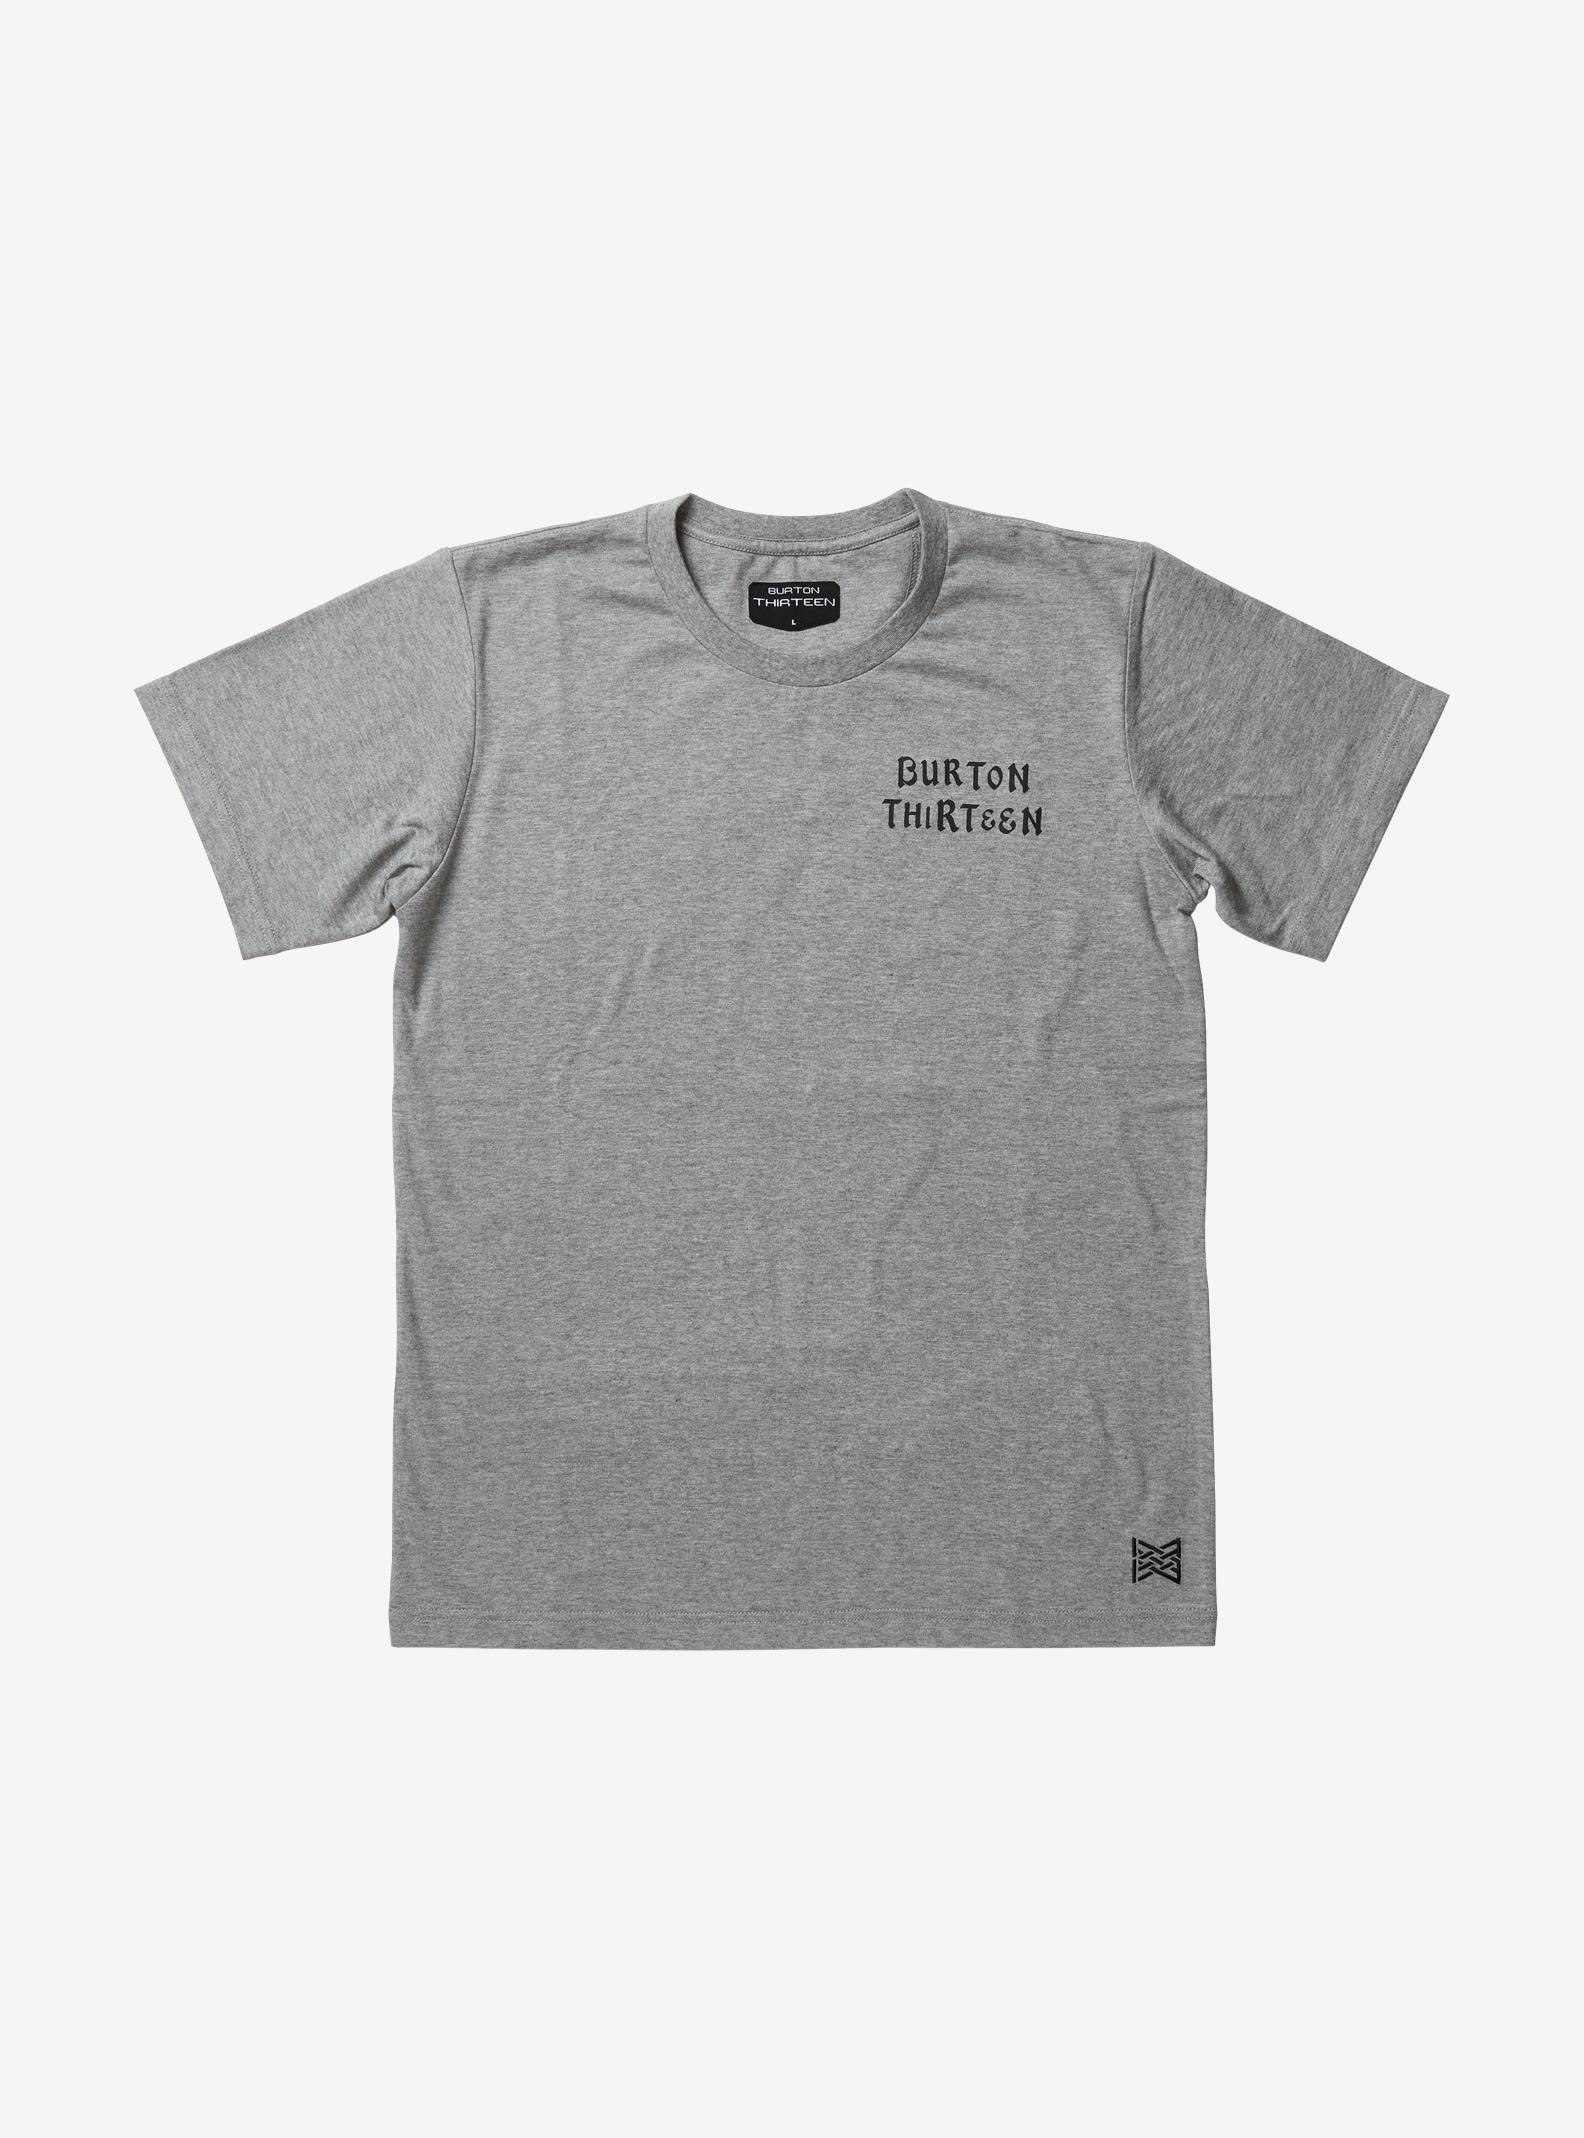 Burton Thirteen Okypete Short Sleeve T Shirt shown in Heather Gray